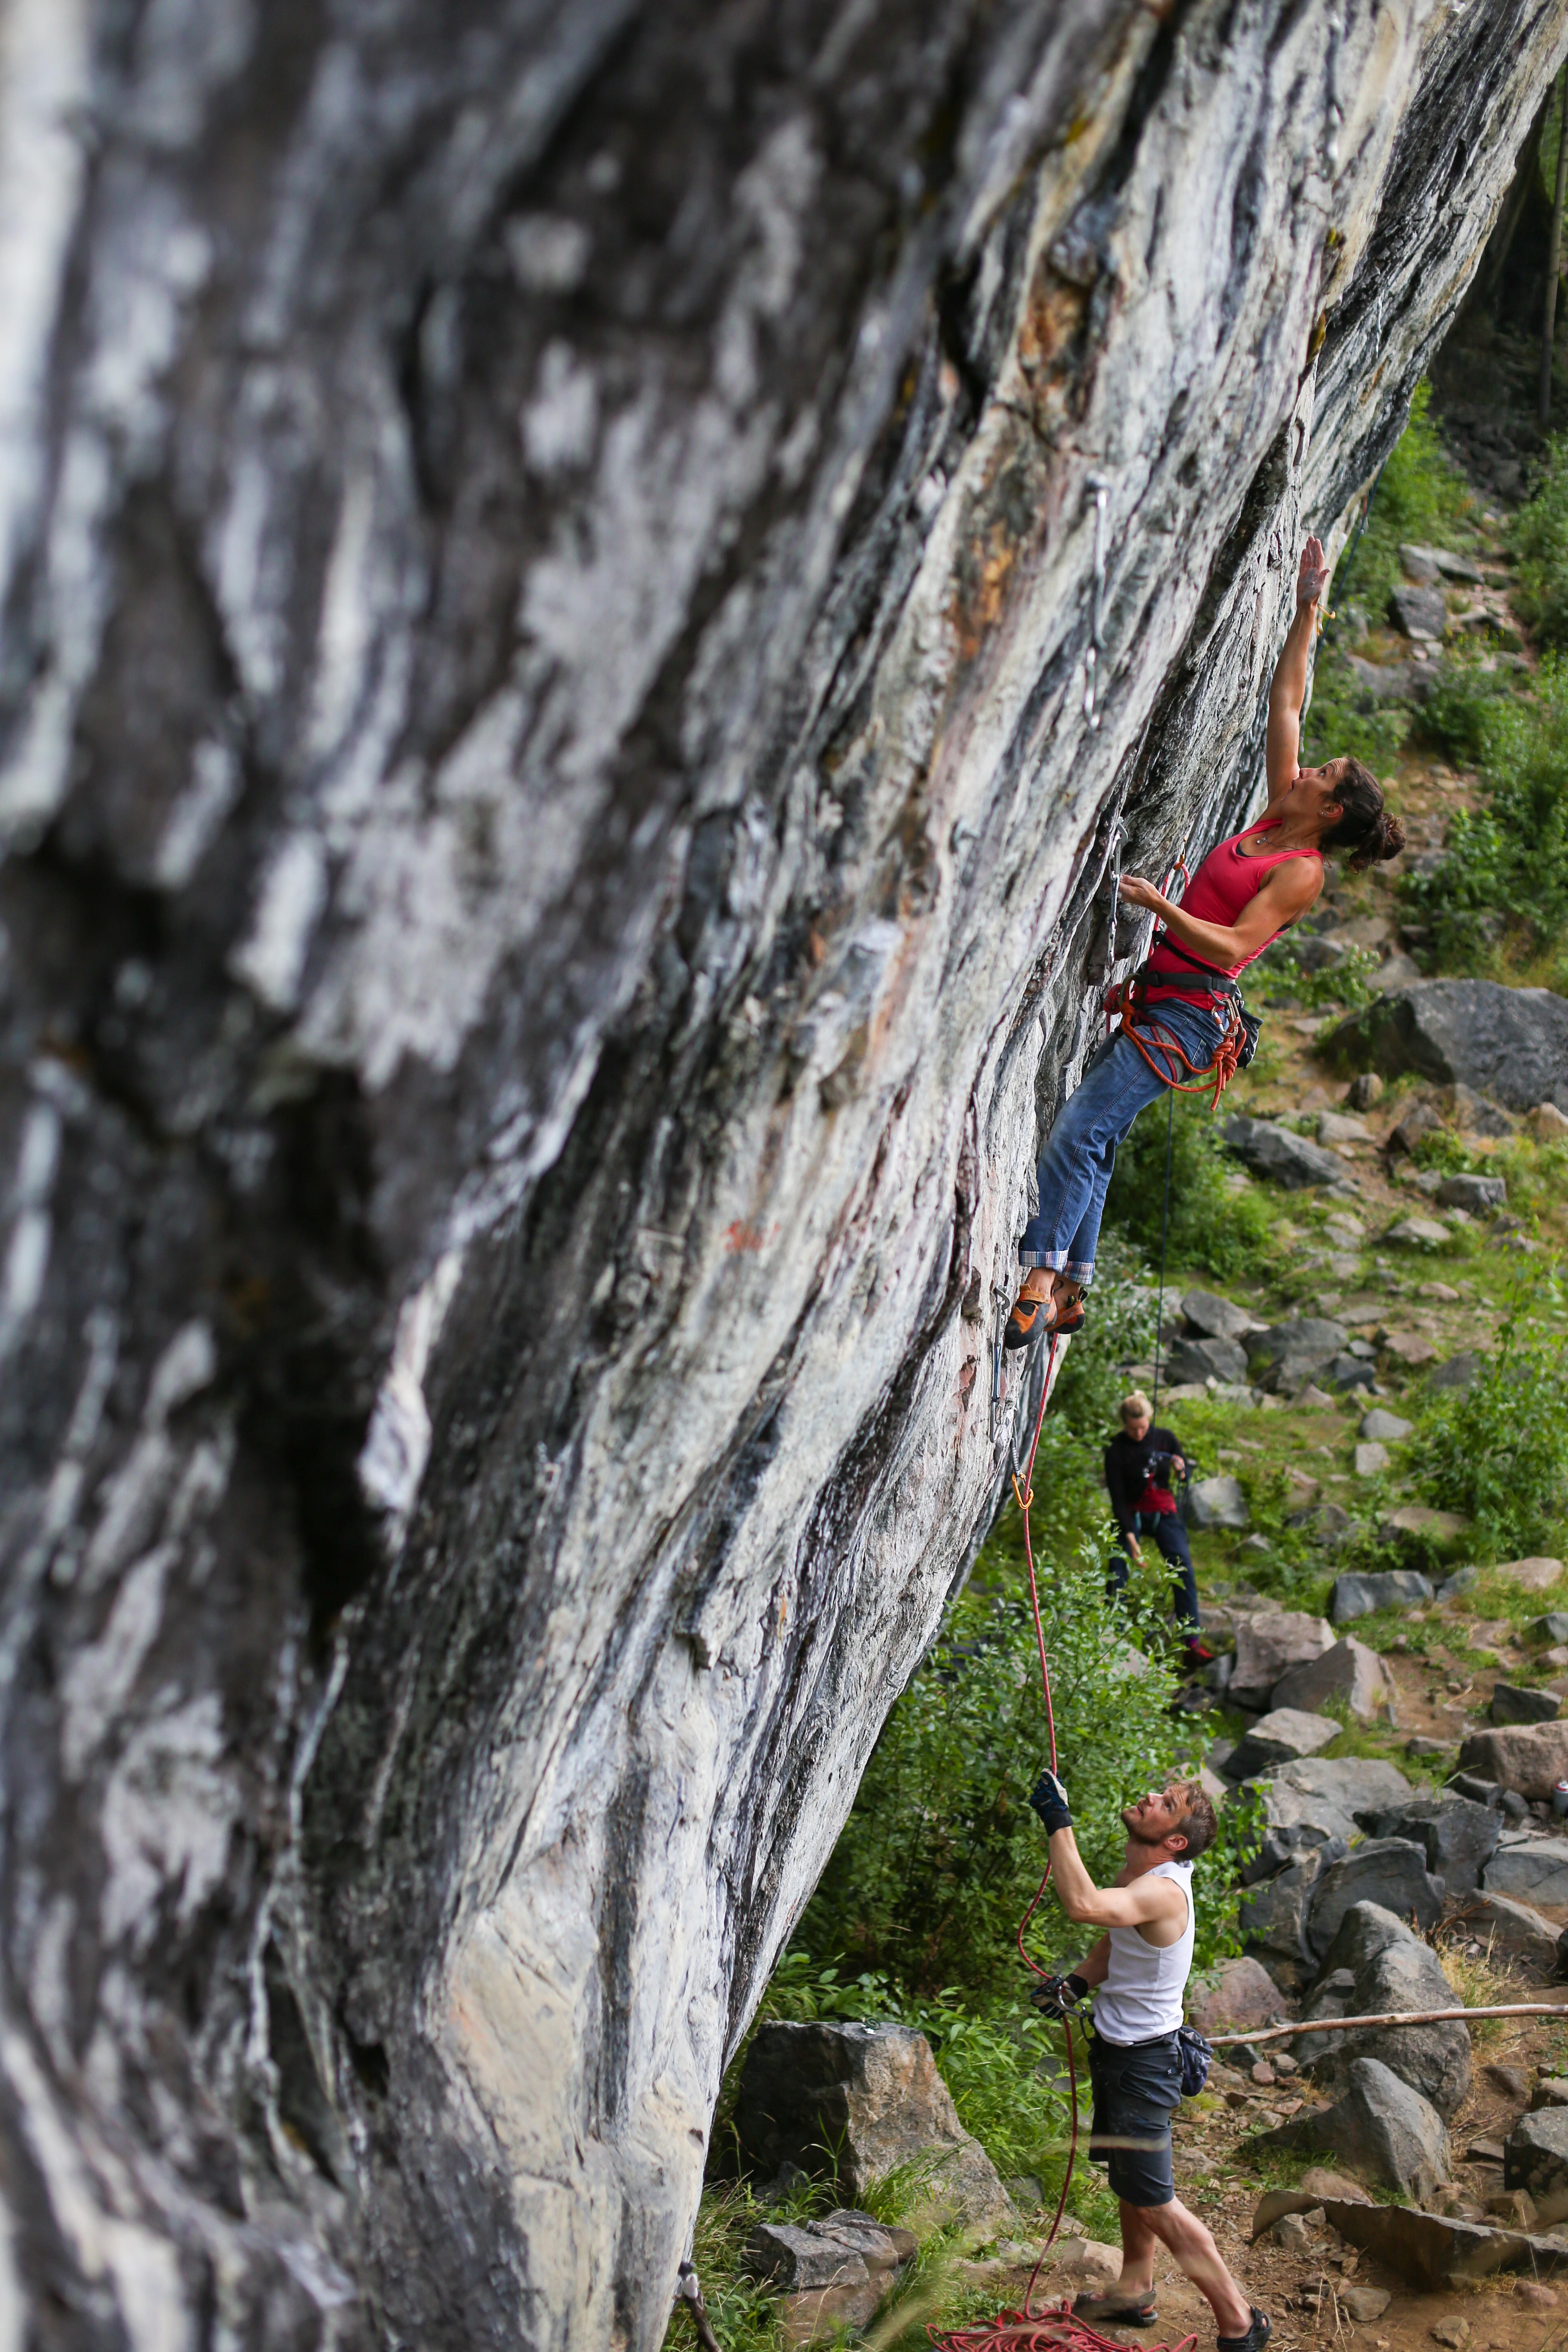 Amelie Desvars climbing in Niemisel, Sweden.